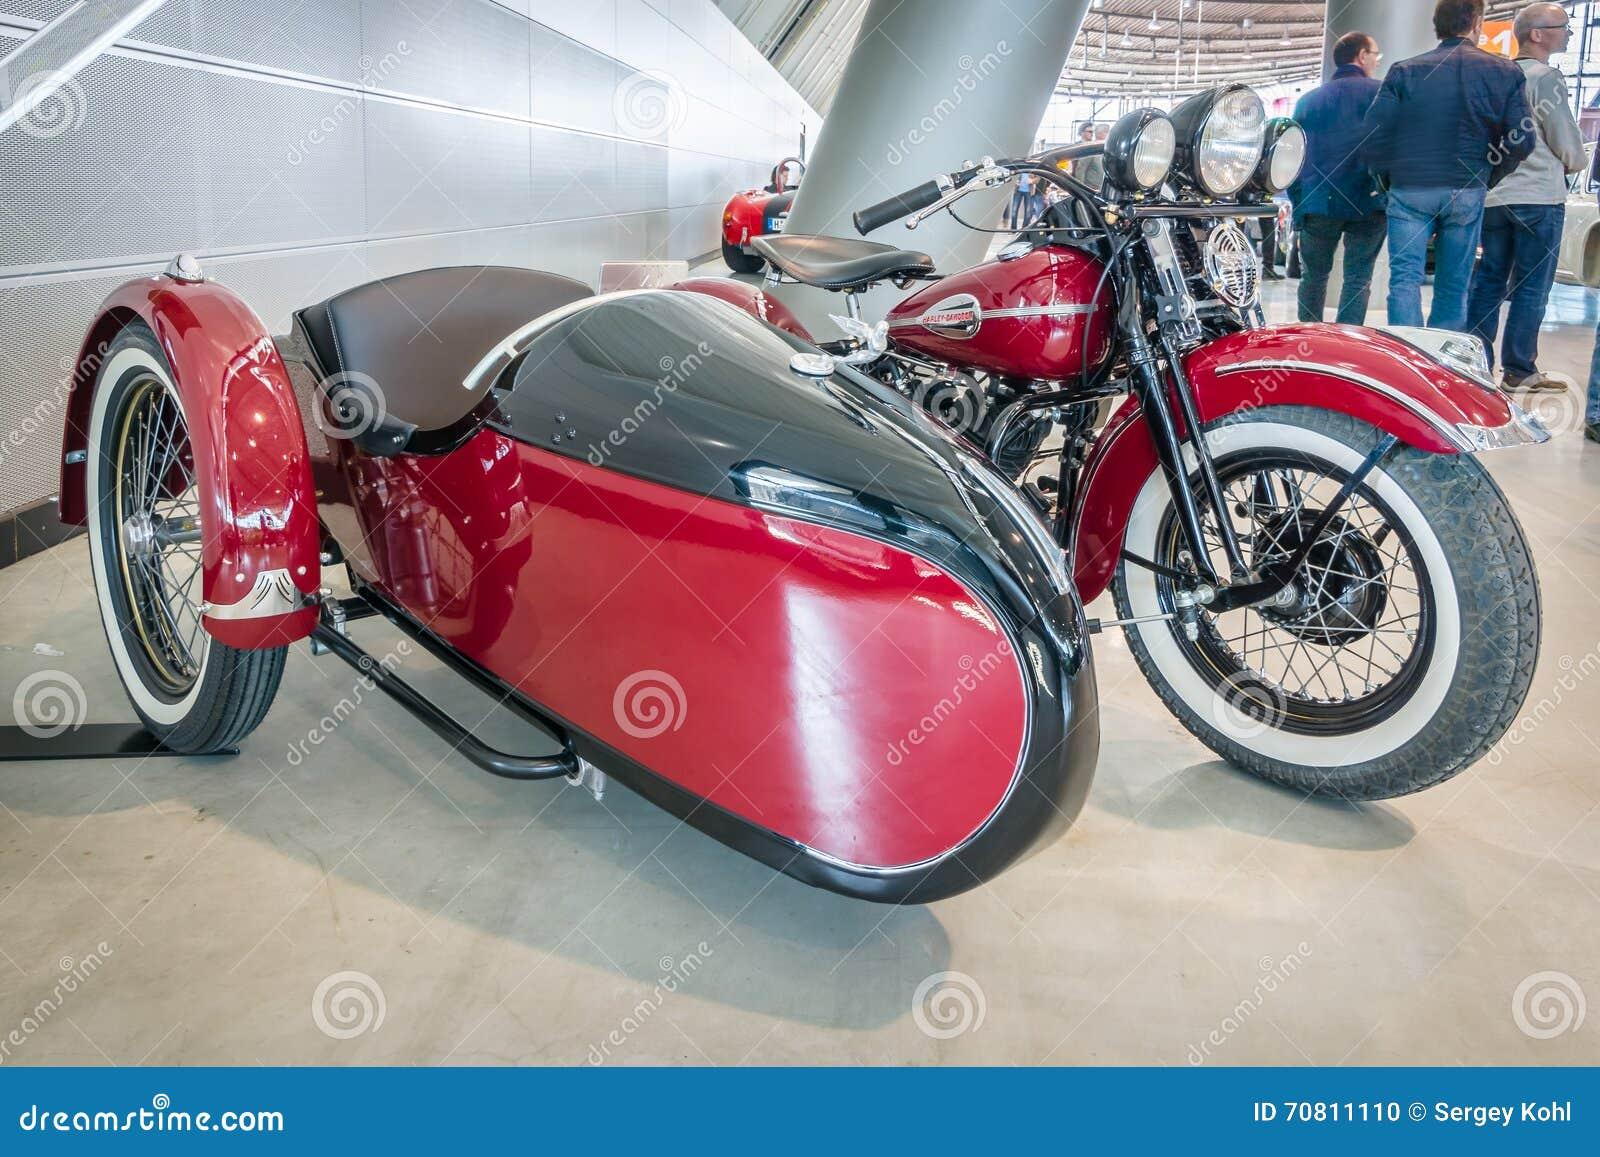 motorcycle harley davidson wla 45 gespann 1944 with. Black Bedroom Furniture Sets. Home Design Ideas